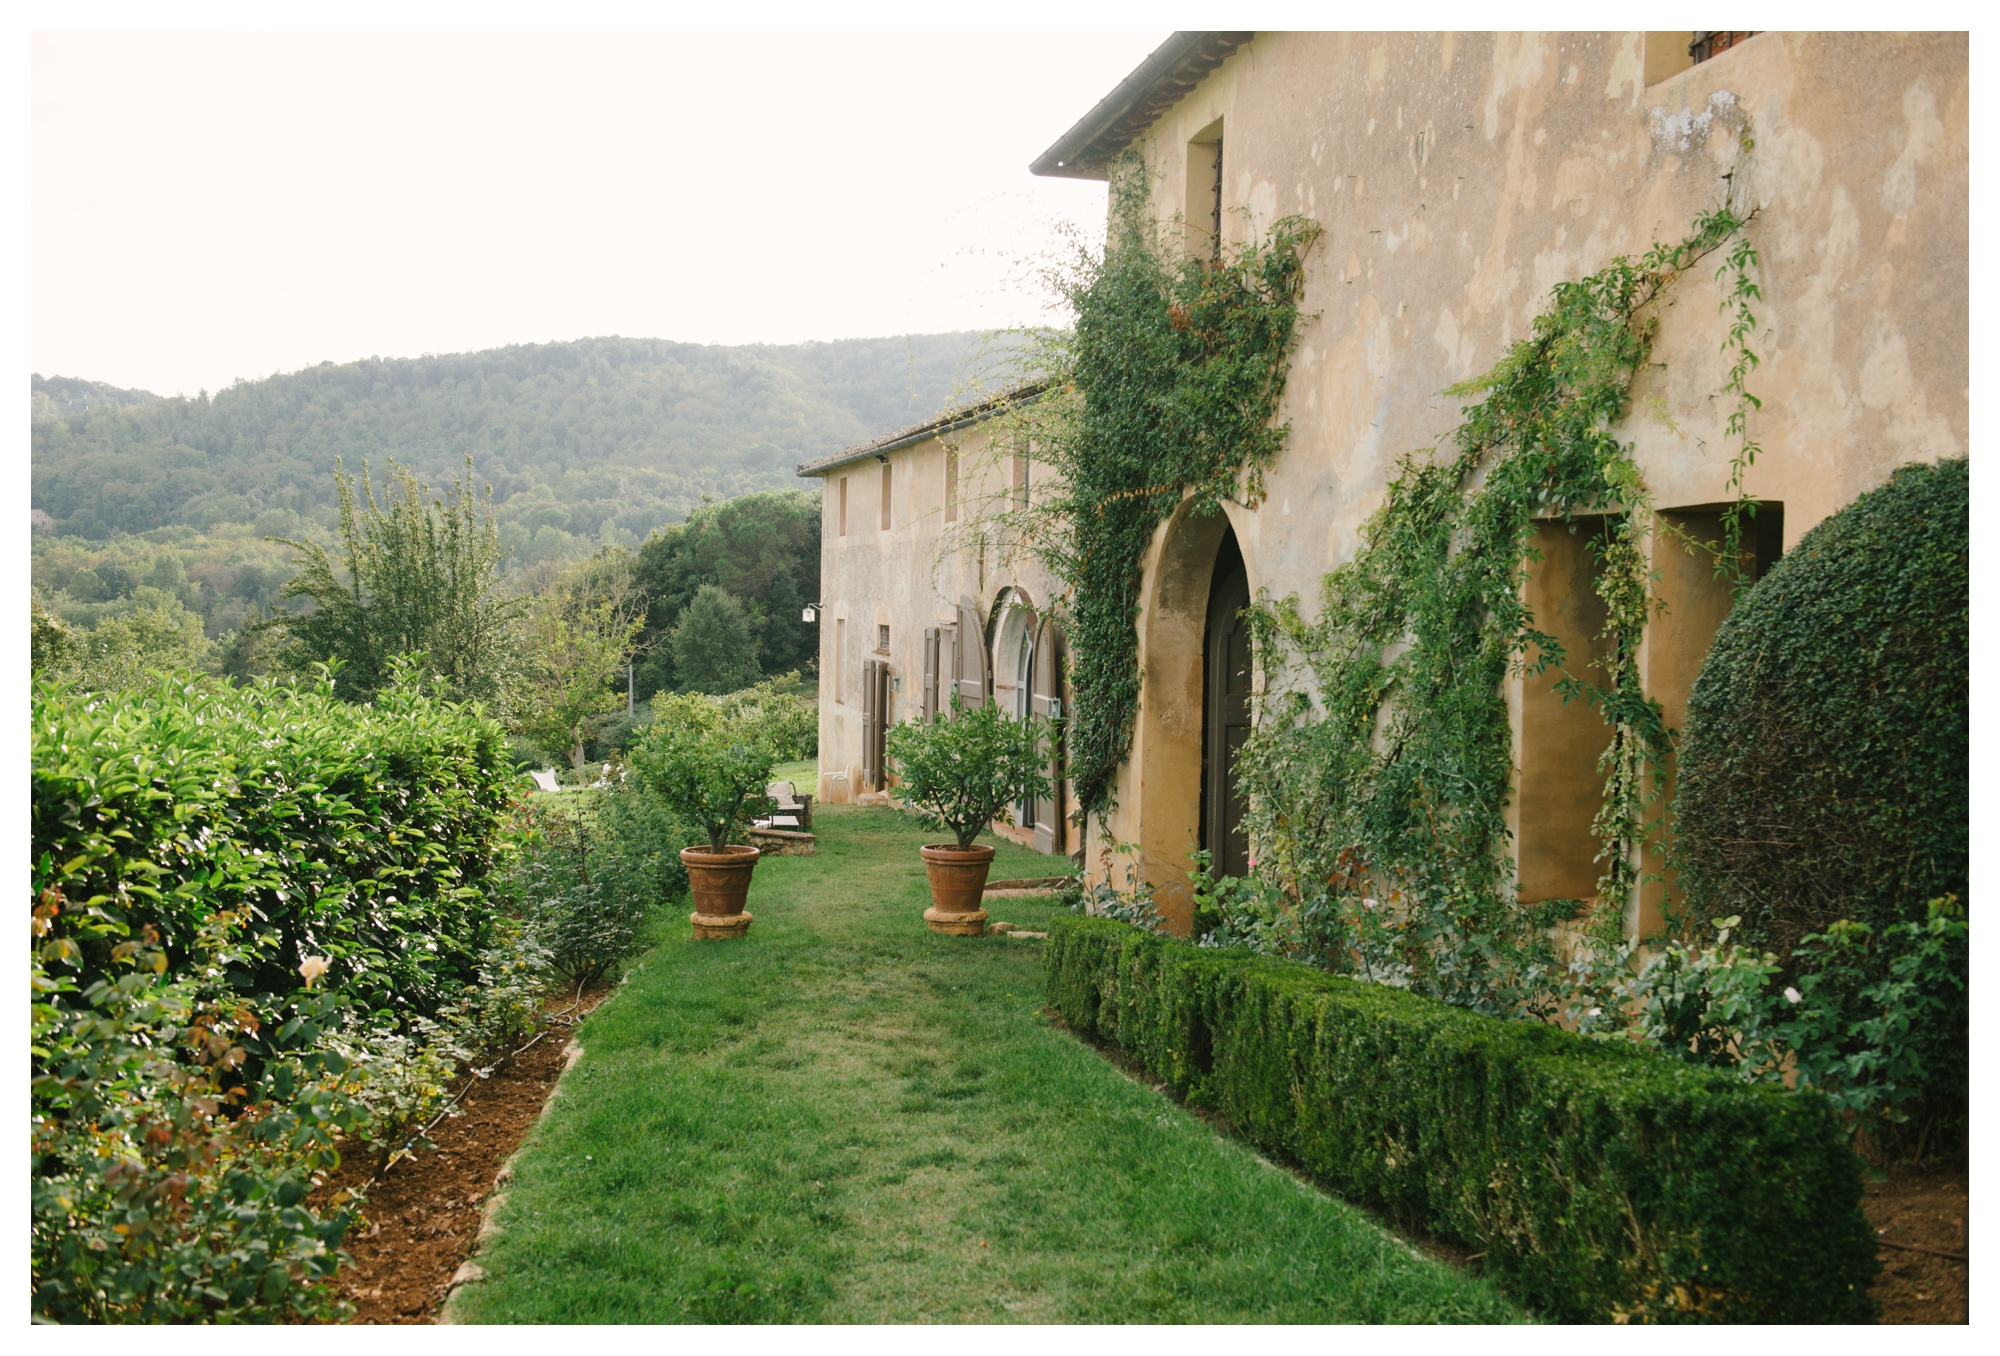 tuscany-castle-wedding-photographer-italy-williamsburgphotostudios-_0003.jpg